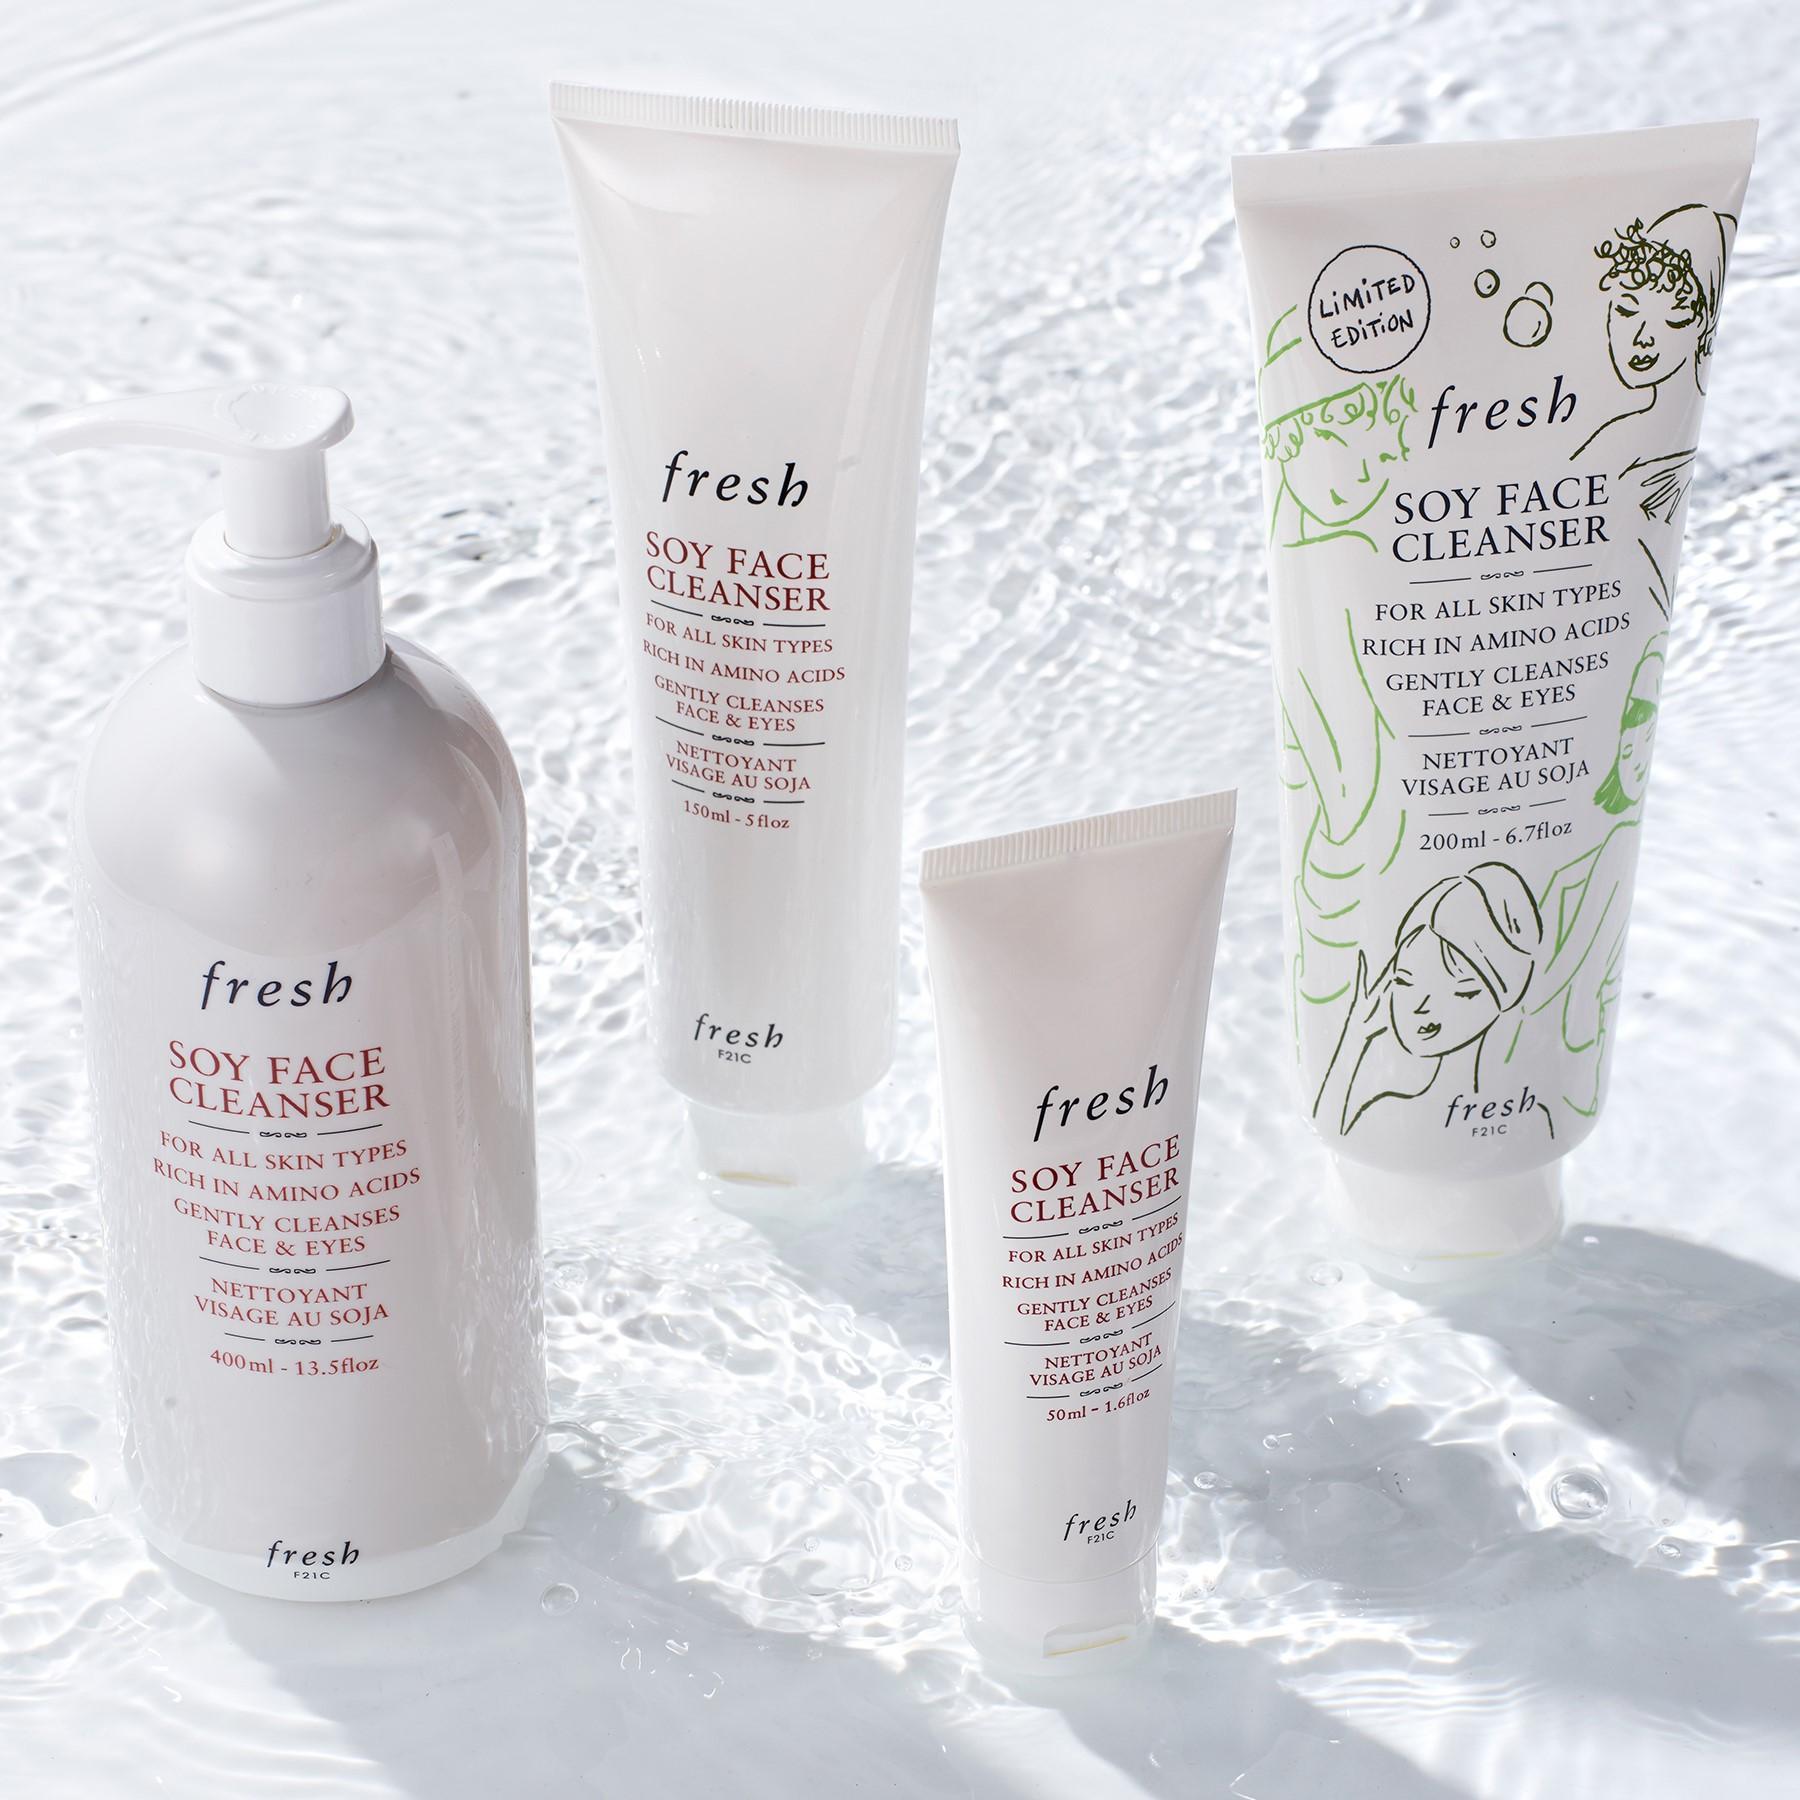 Fresh:李佳琦推荐 天然护肤品牌